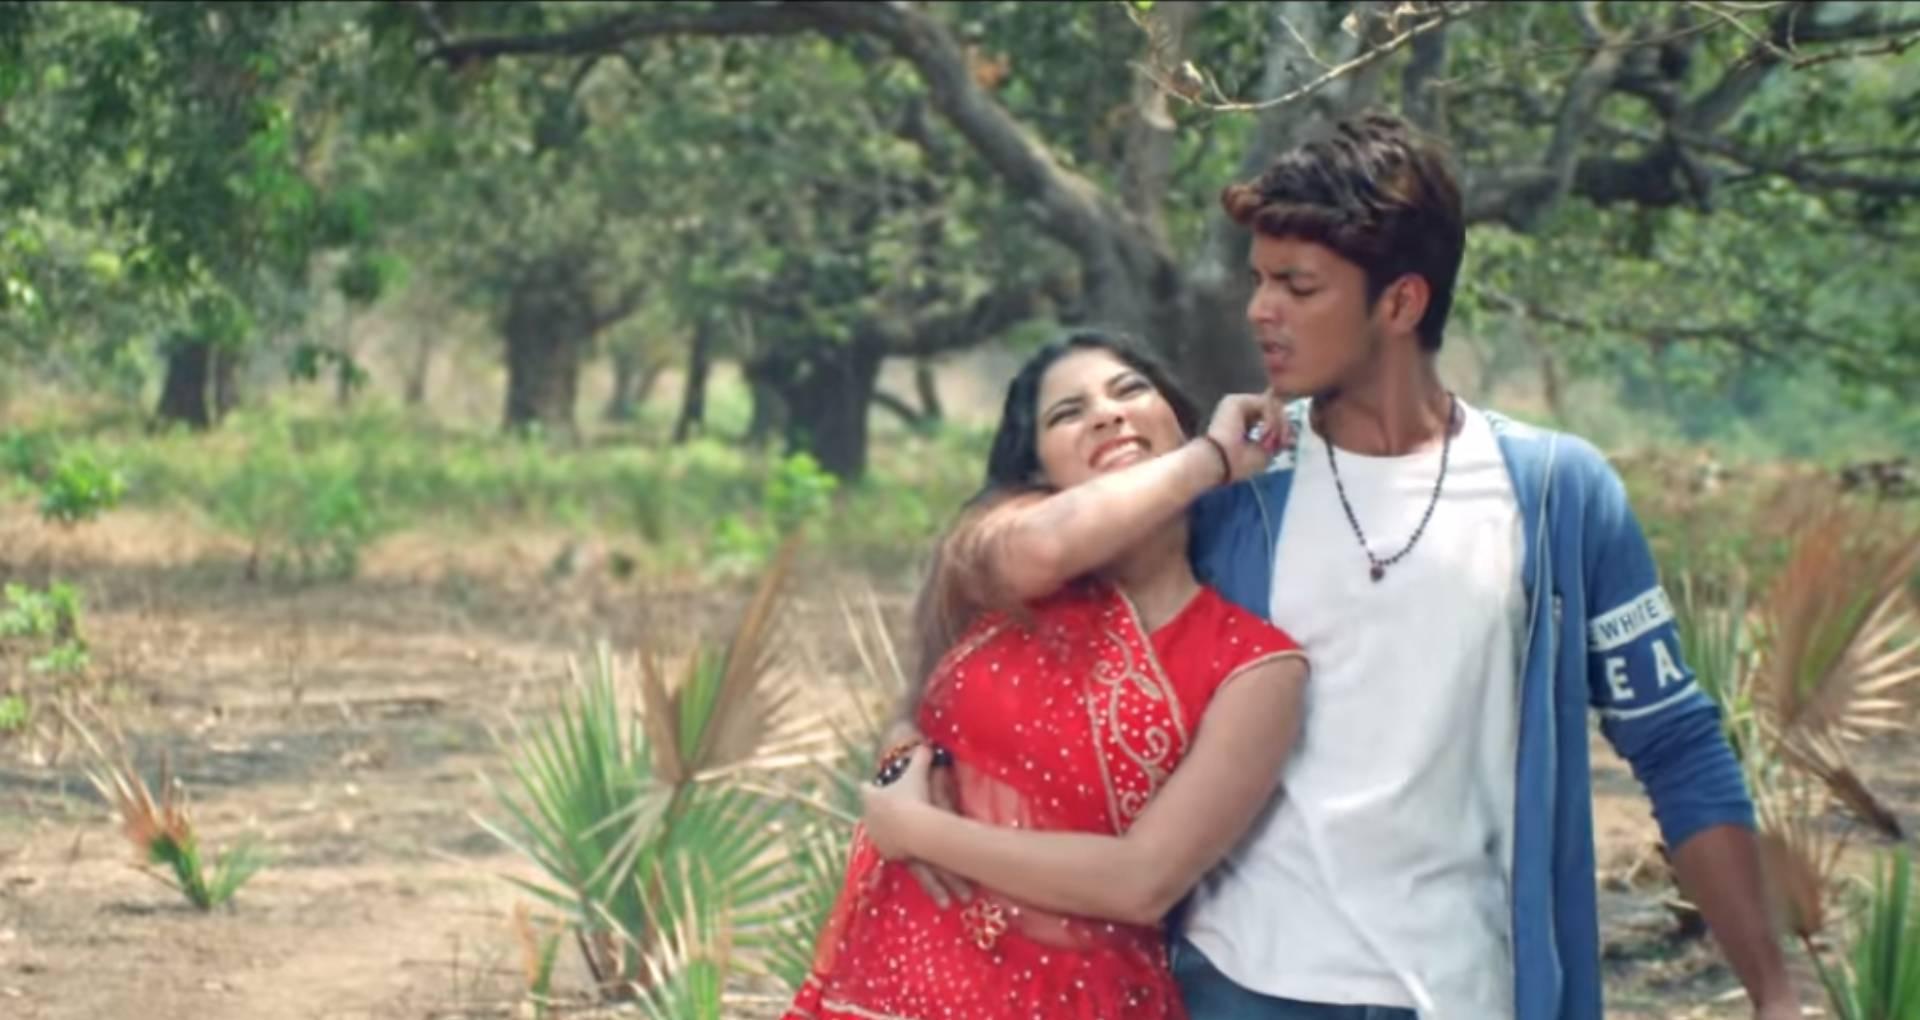 भोजपुरी फिल्म राजा हो गईल दीवाना का ट्रेलर लॉन्च, ऋषभ कश्यप-पूजा भट्ट की लव स्टोरी में दिखा दमदार एक्शन